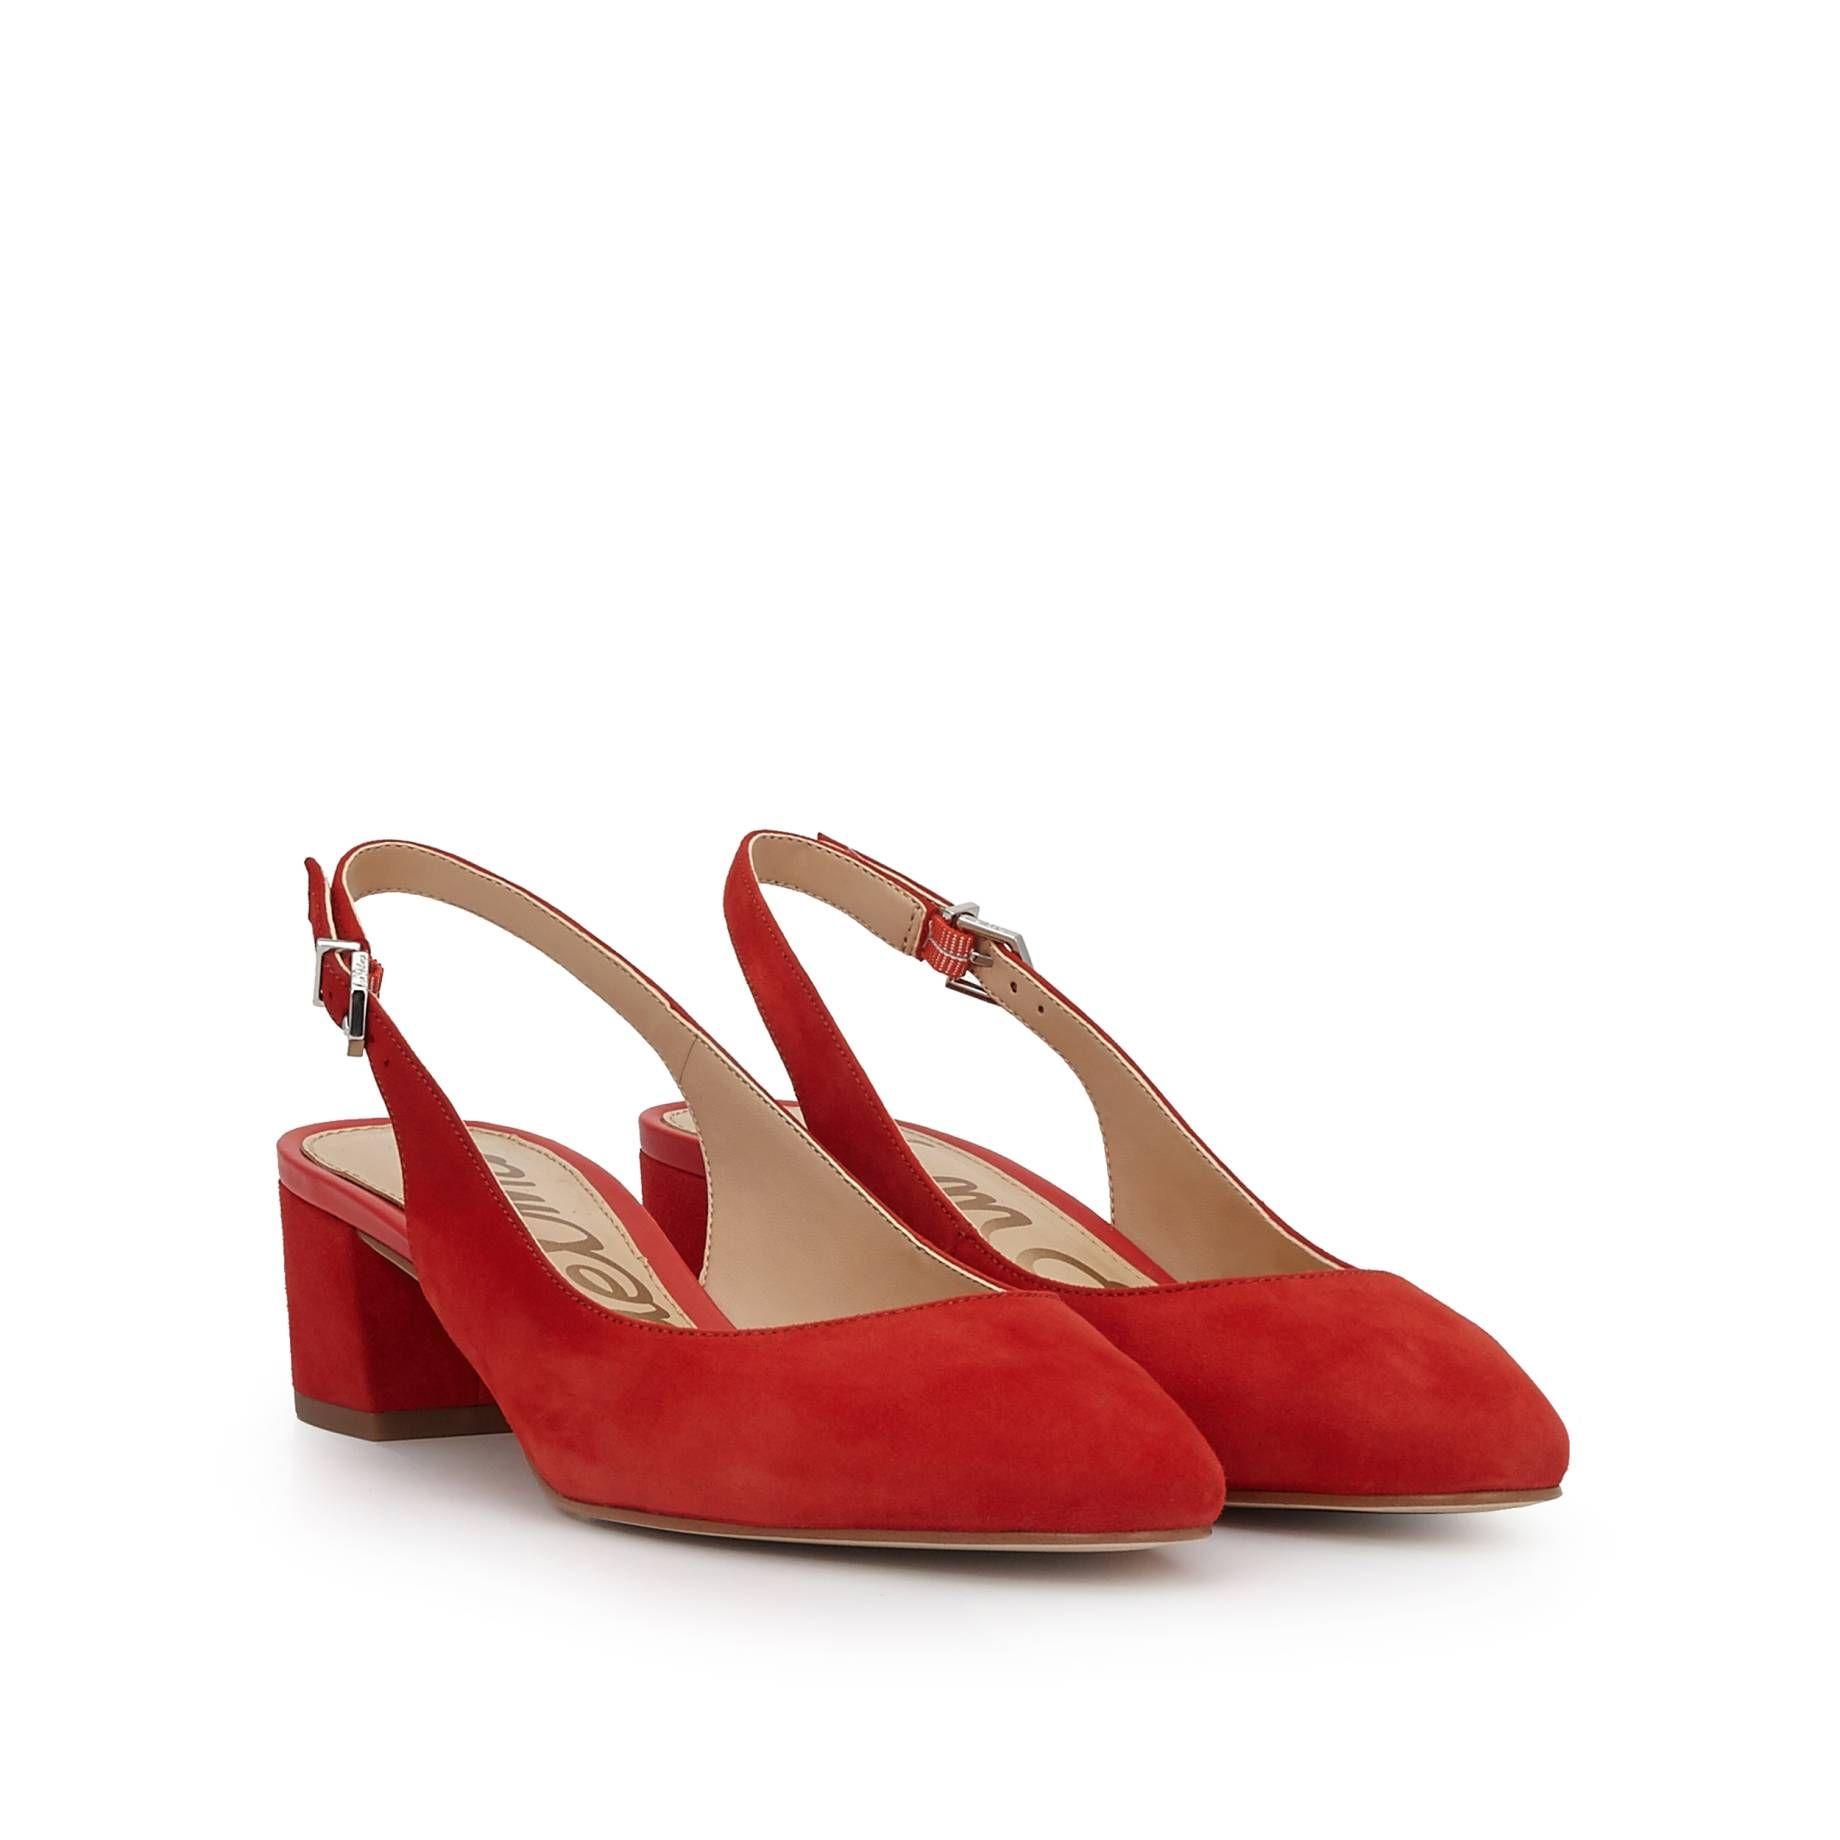 274c1b5bc76 Lorene Slingback Block Heel by Sam Edelman - Blood Orange Suede - View 1